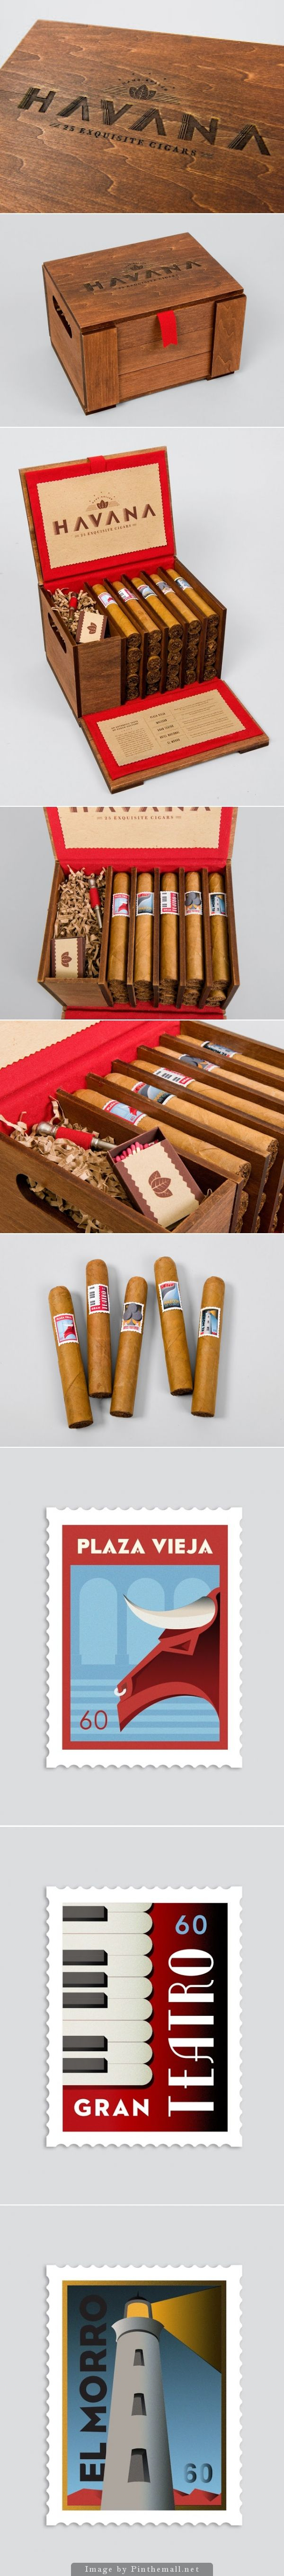 Havana Cigars (Student Project)